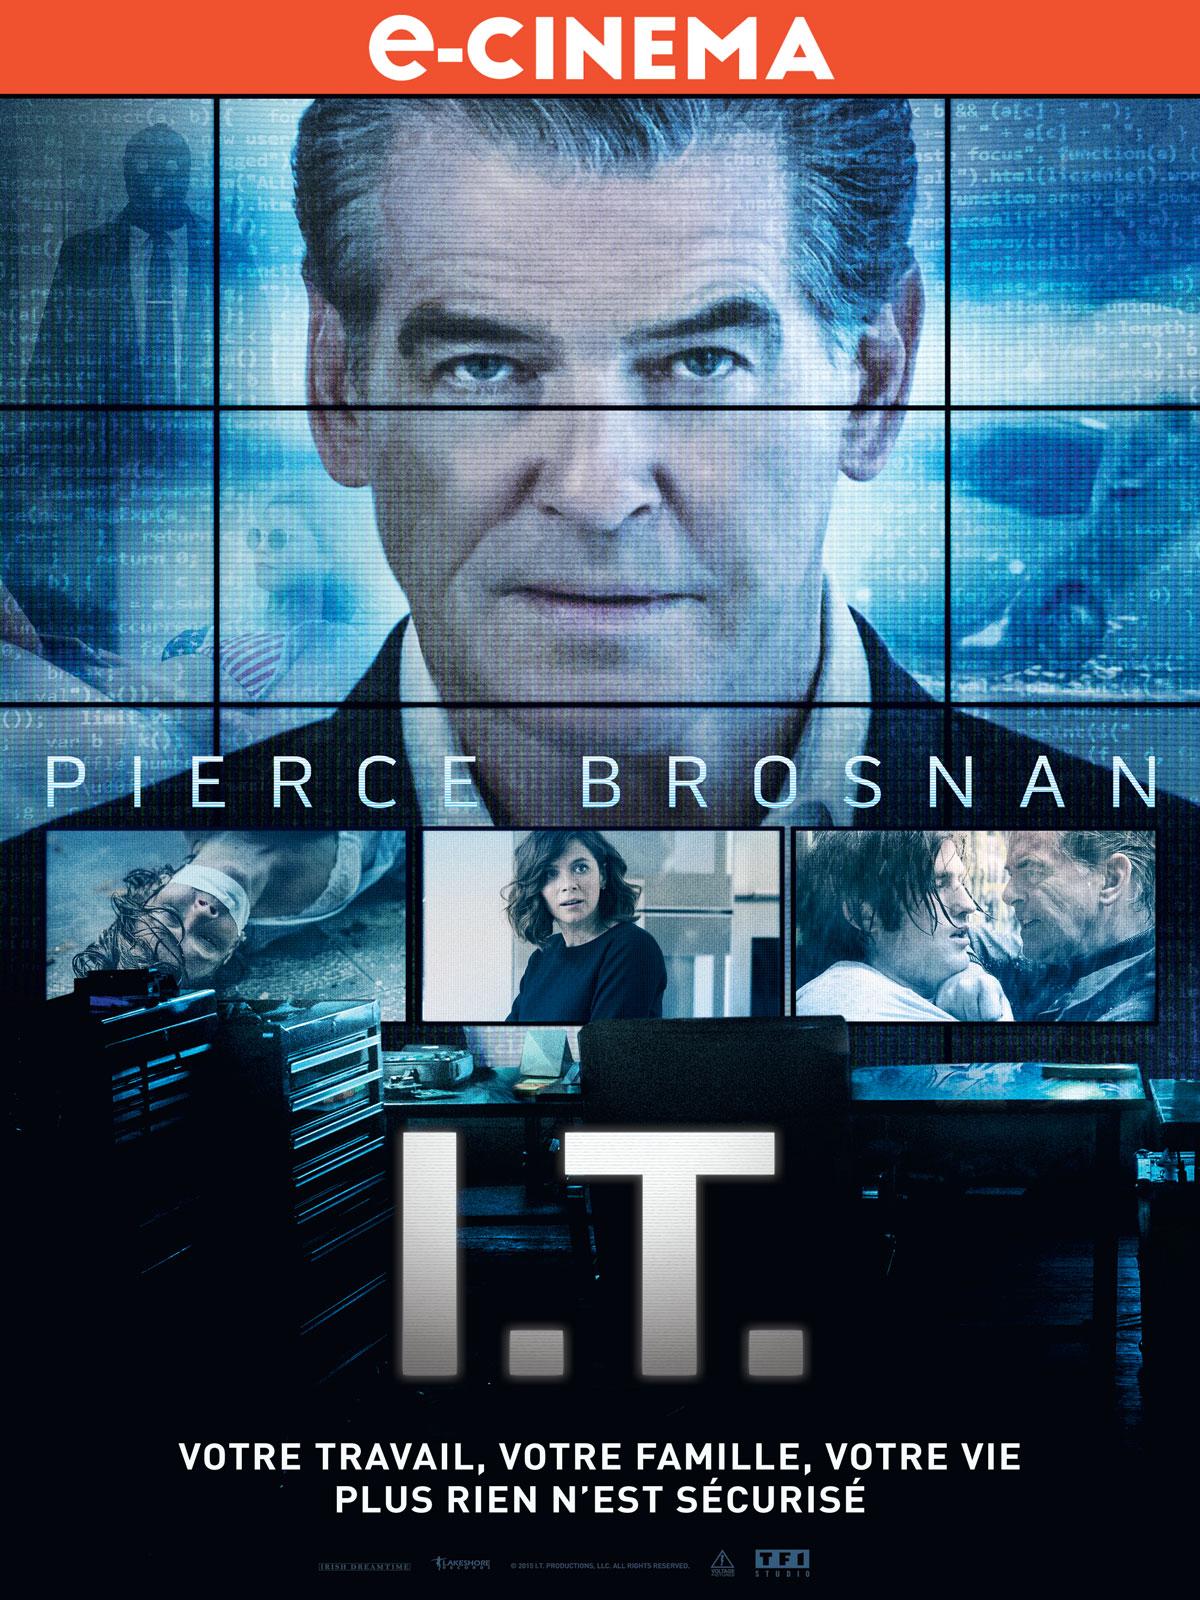 Film Avec Pierce Brosnan : pierce, brosnan, Achat, AlloCiné